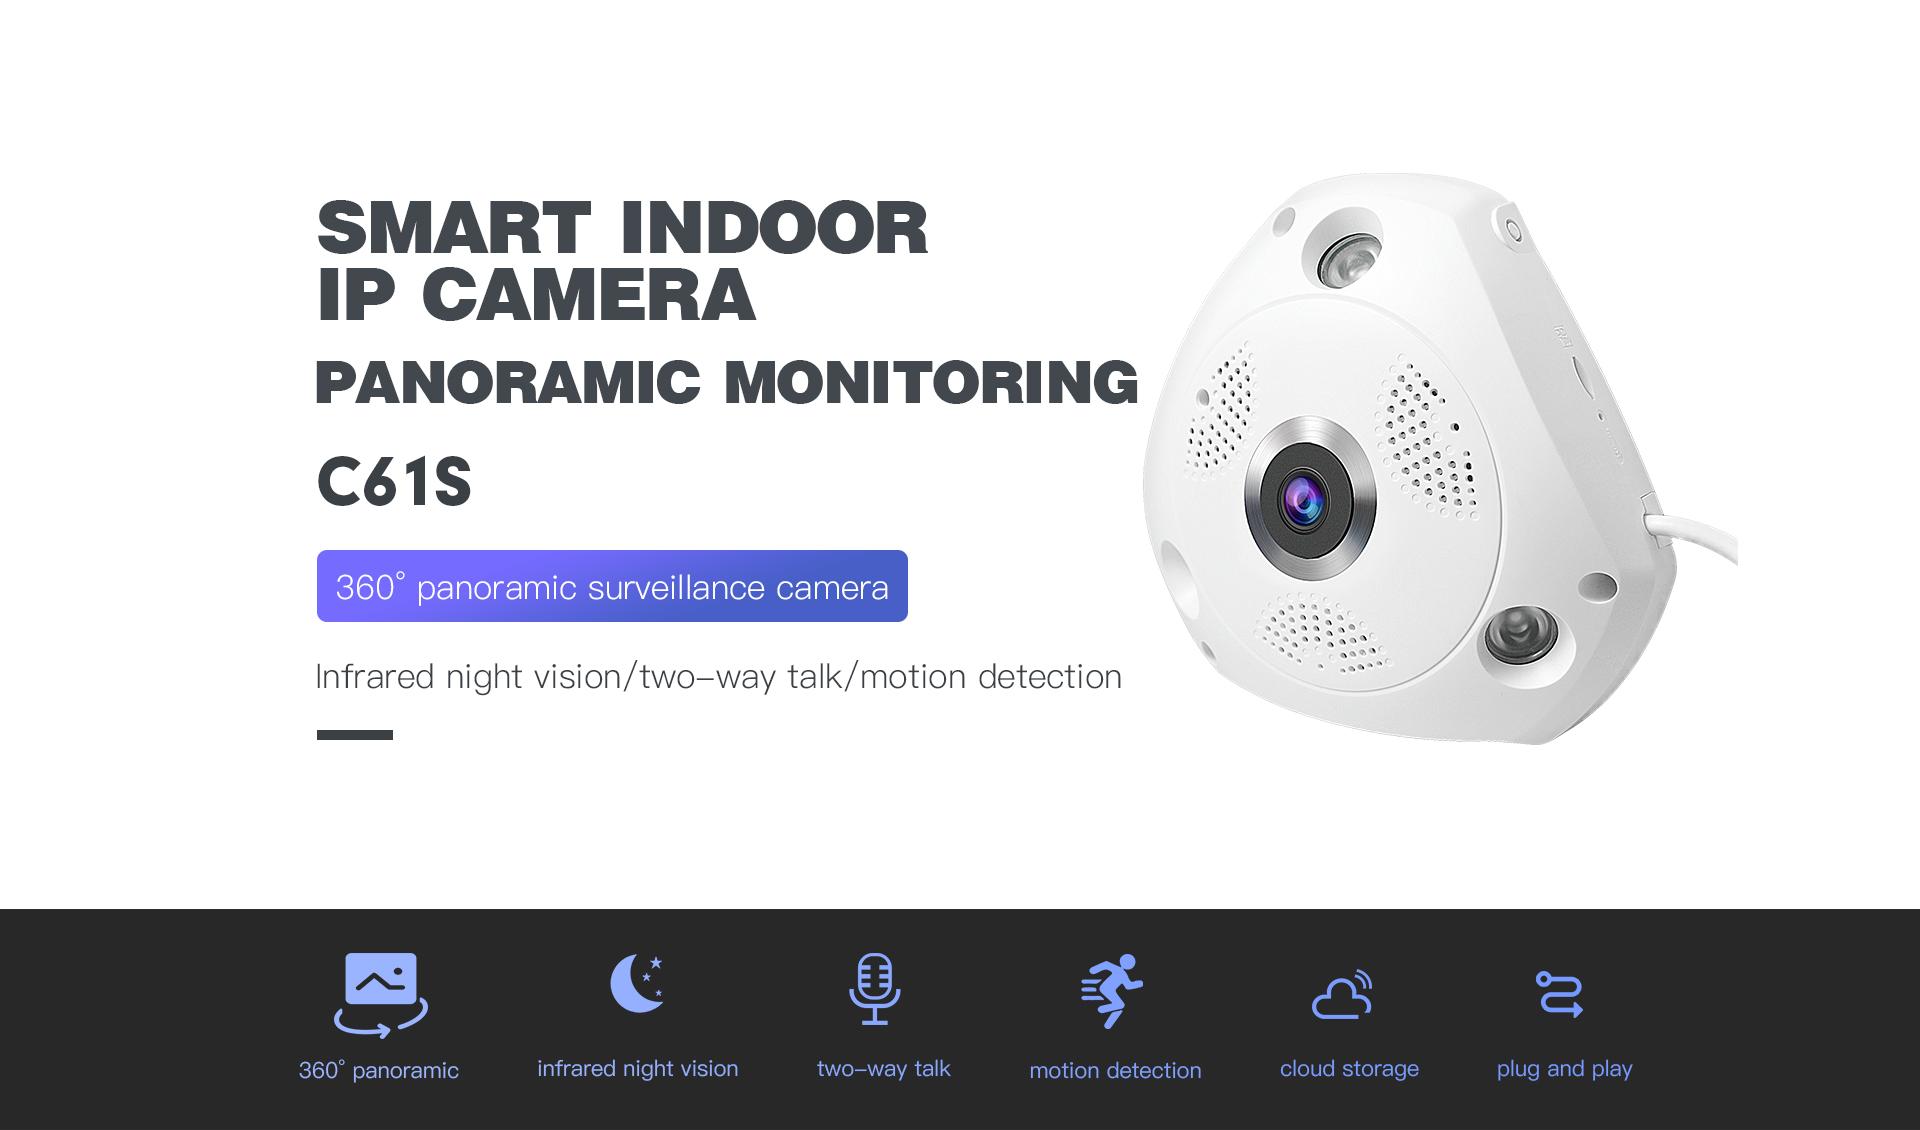 Panoramic Indoor Security Camera